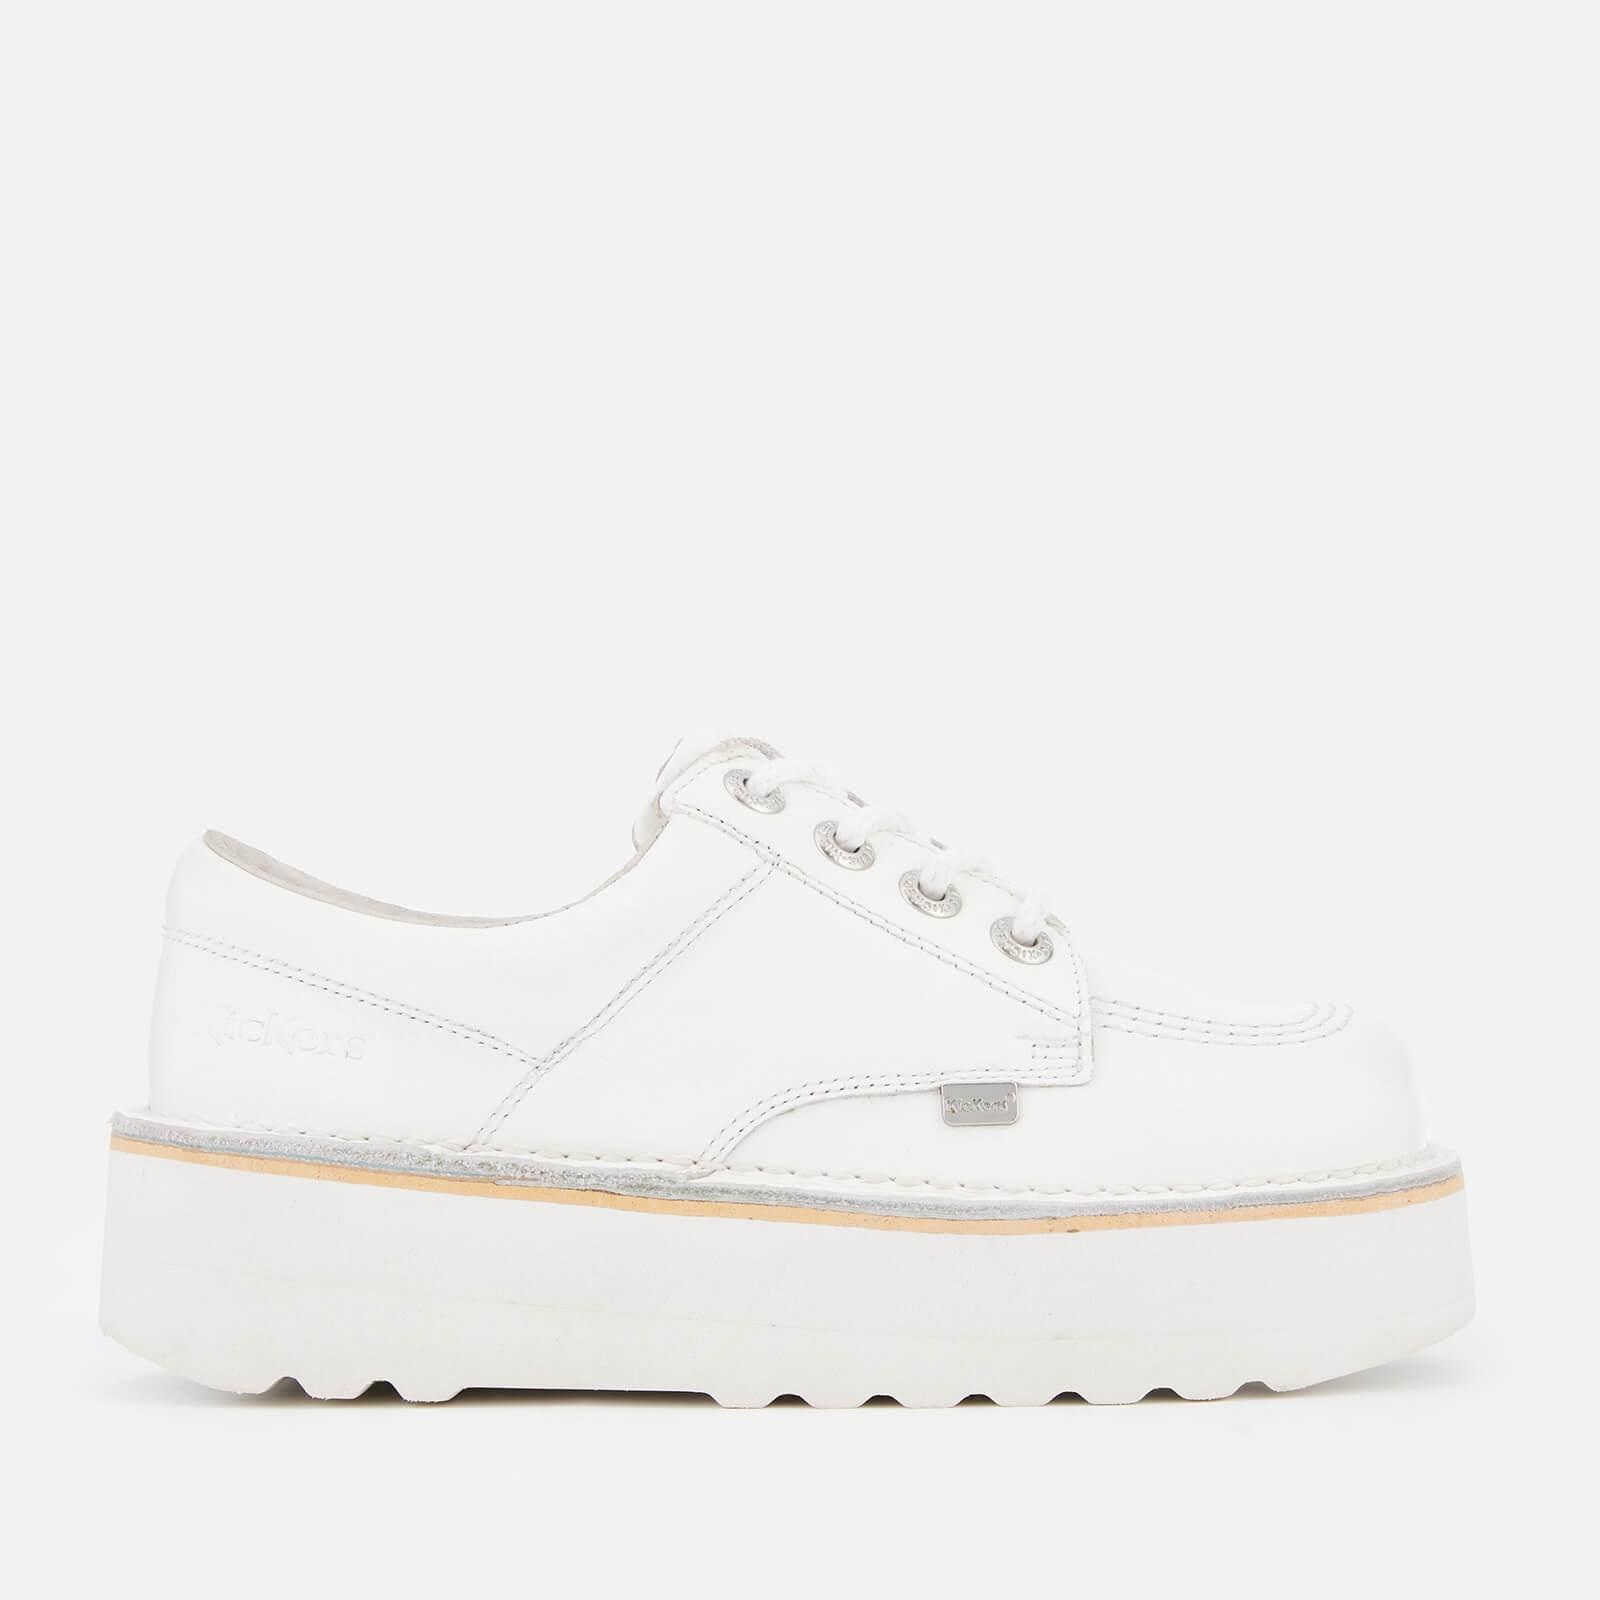 Kickers Women's Kick Lo Stack Shoes - White/Metallic - UK 5 - White